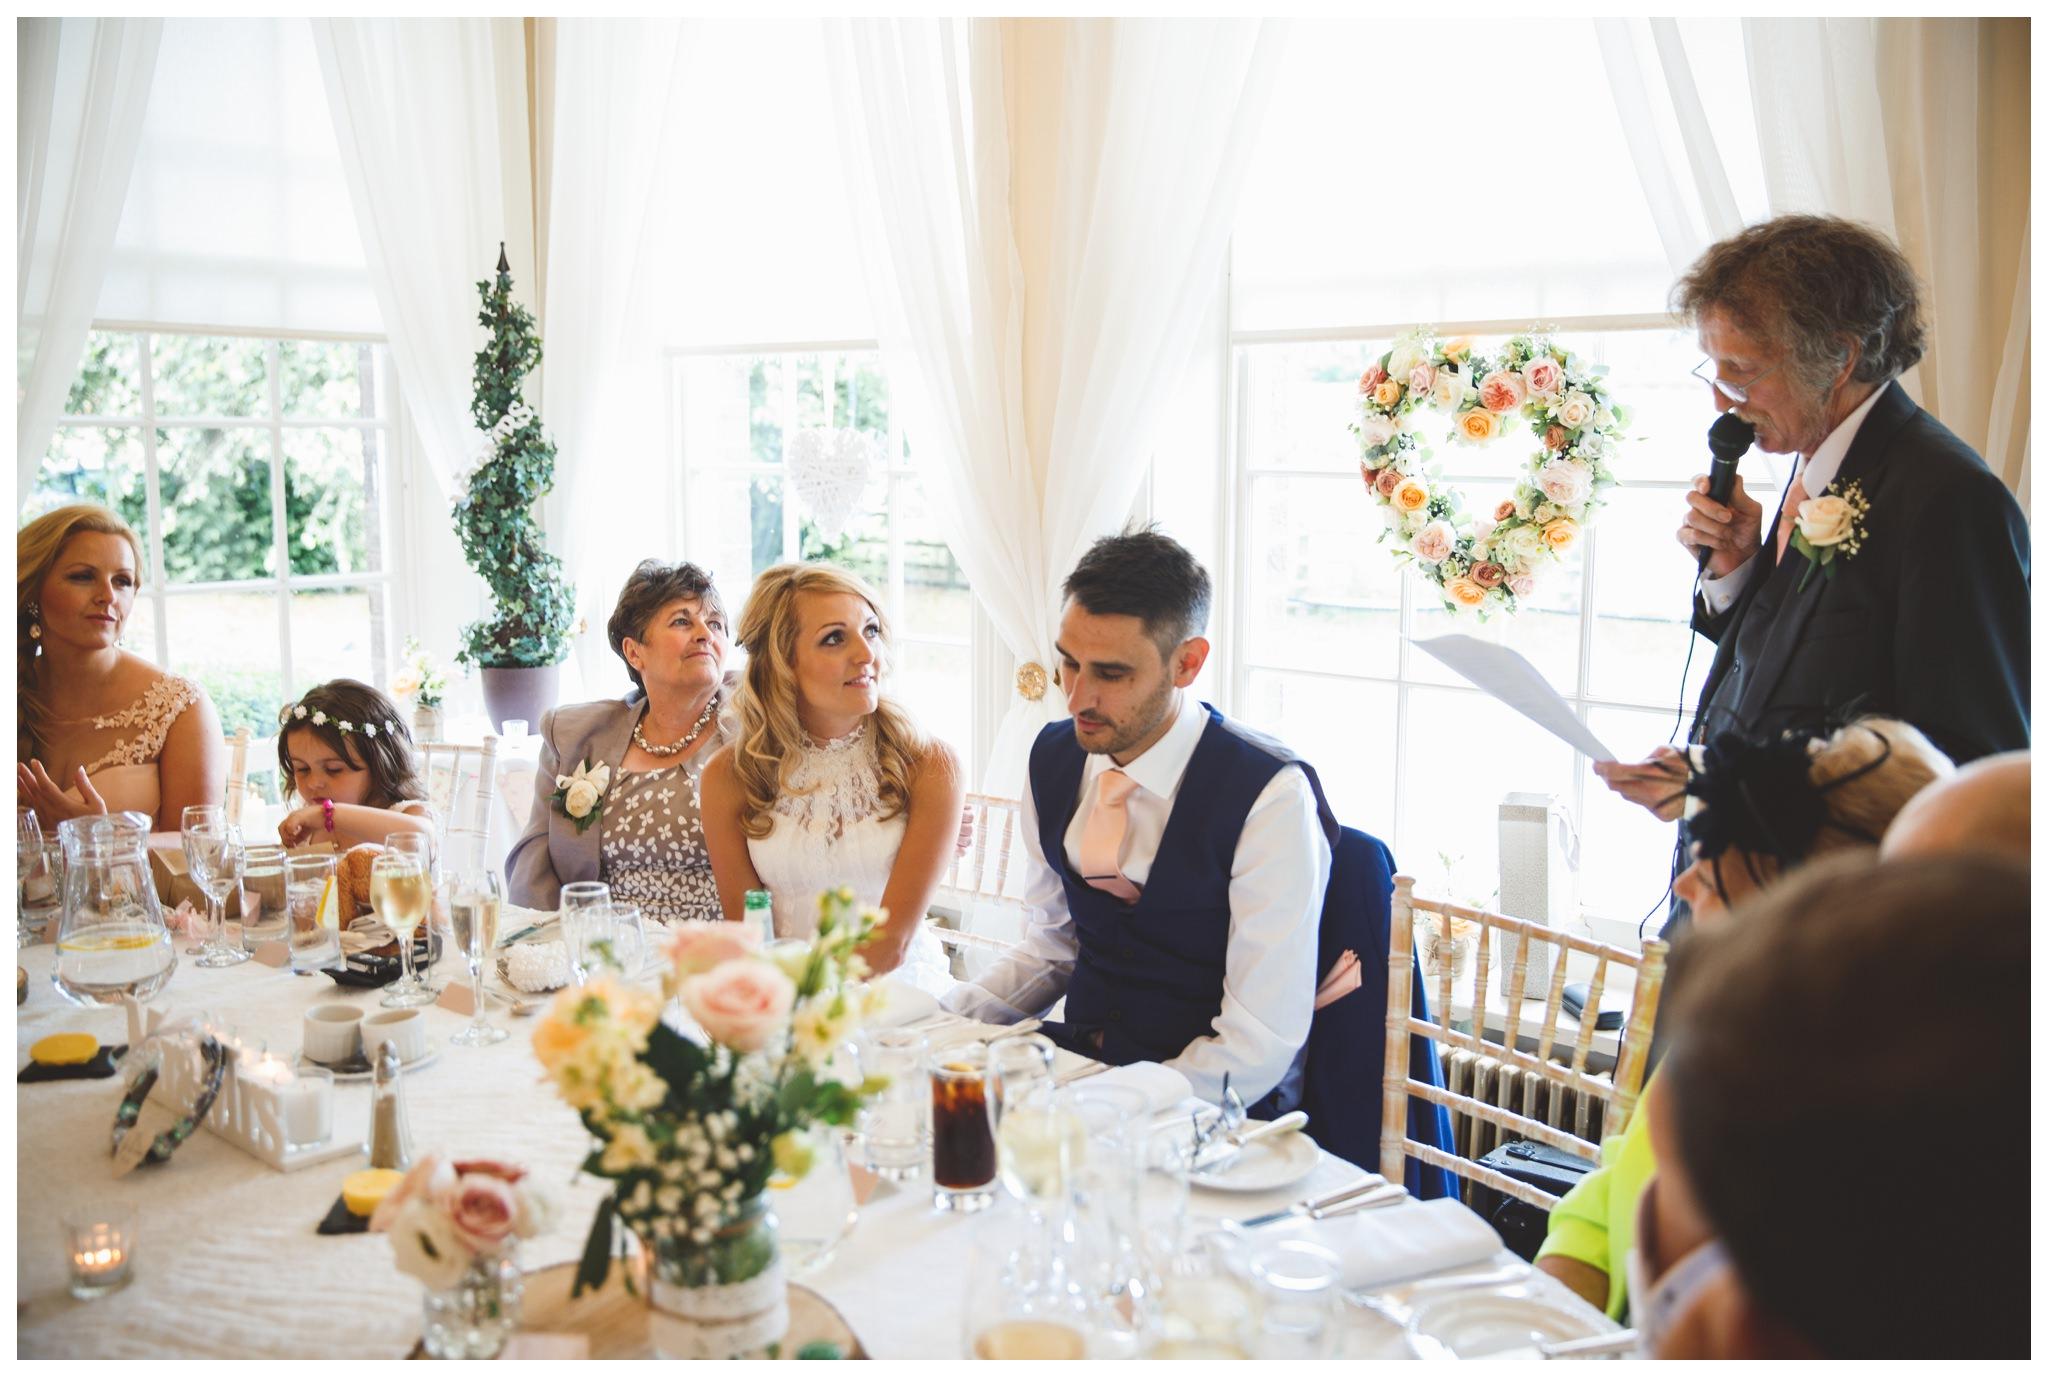 Richard Savage Photography - Wedding - Peterstone Court Brecon - 2016-05-11_0048